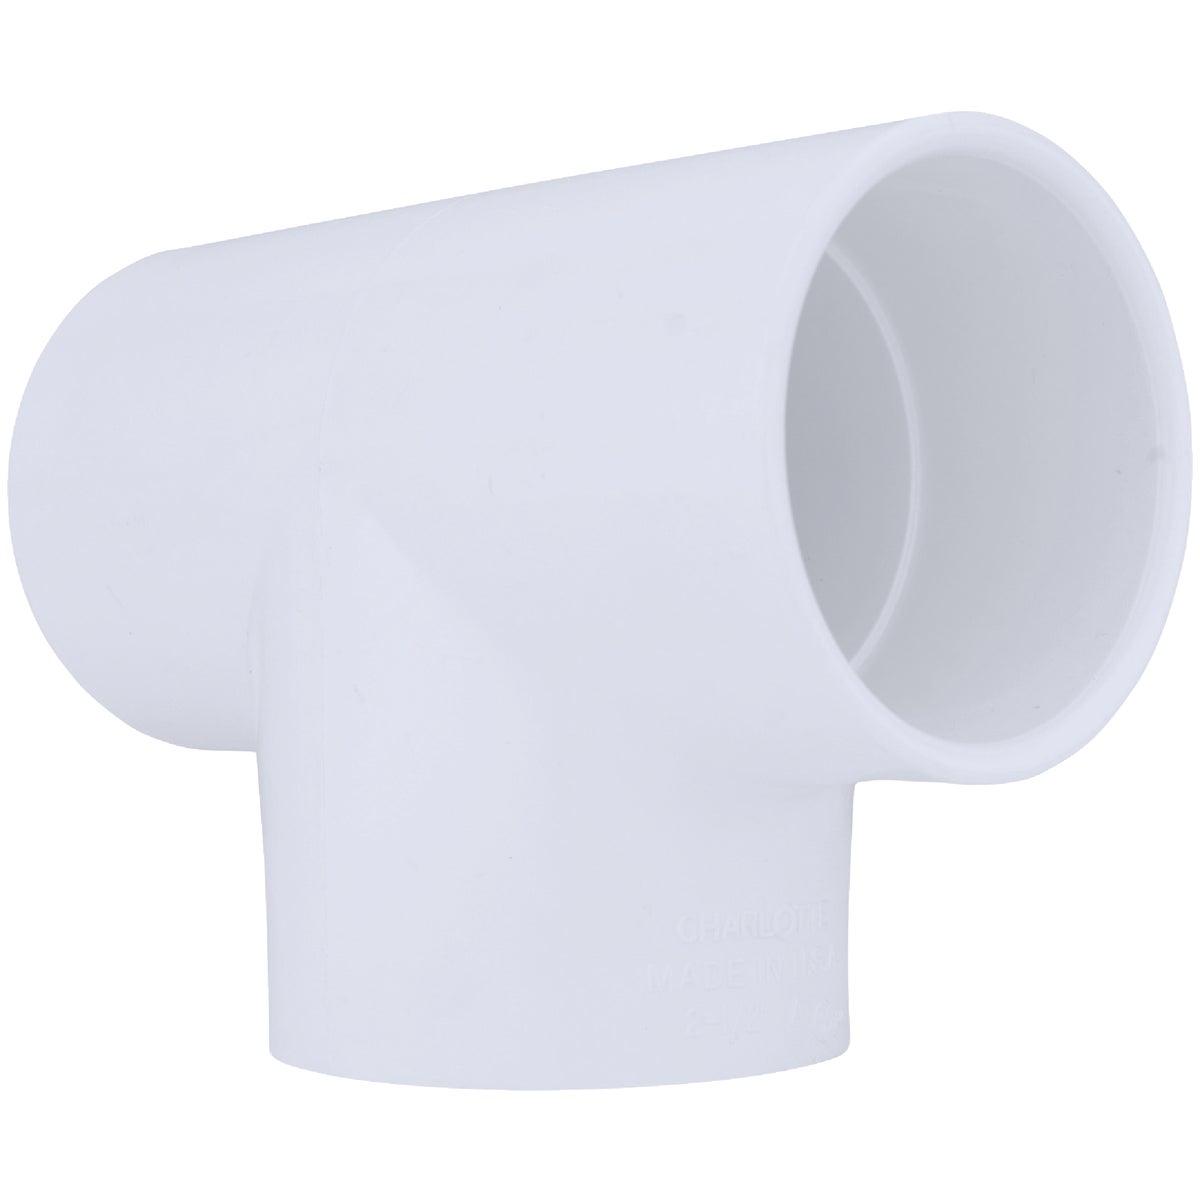 "2-1/2"" SCH40 PVC TEE - 31450 by Genova Inc"